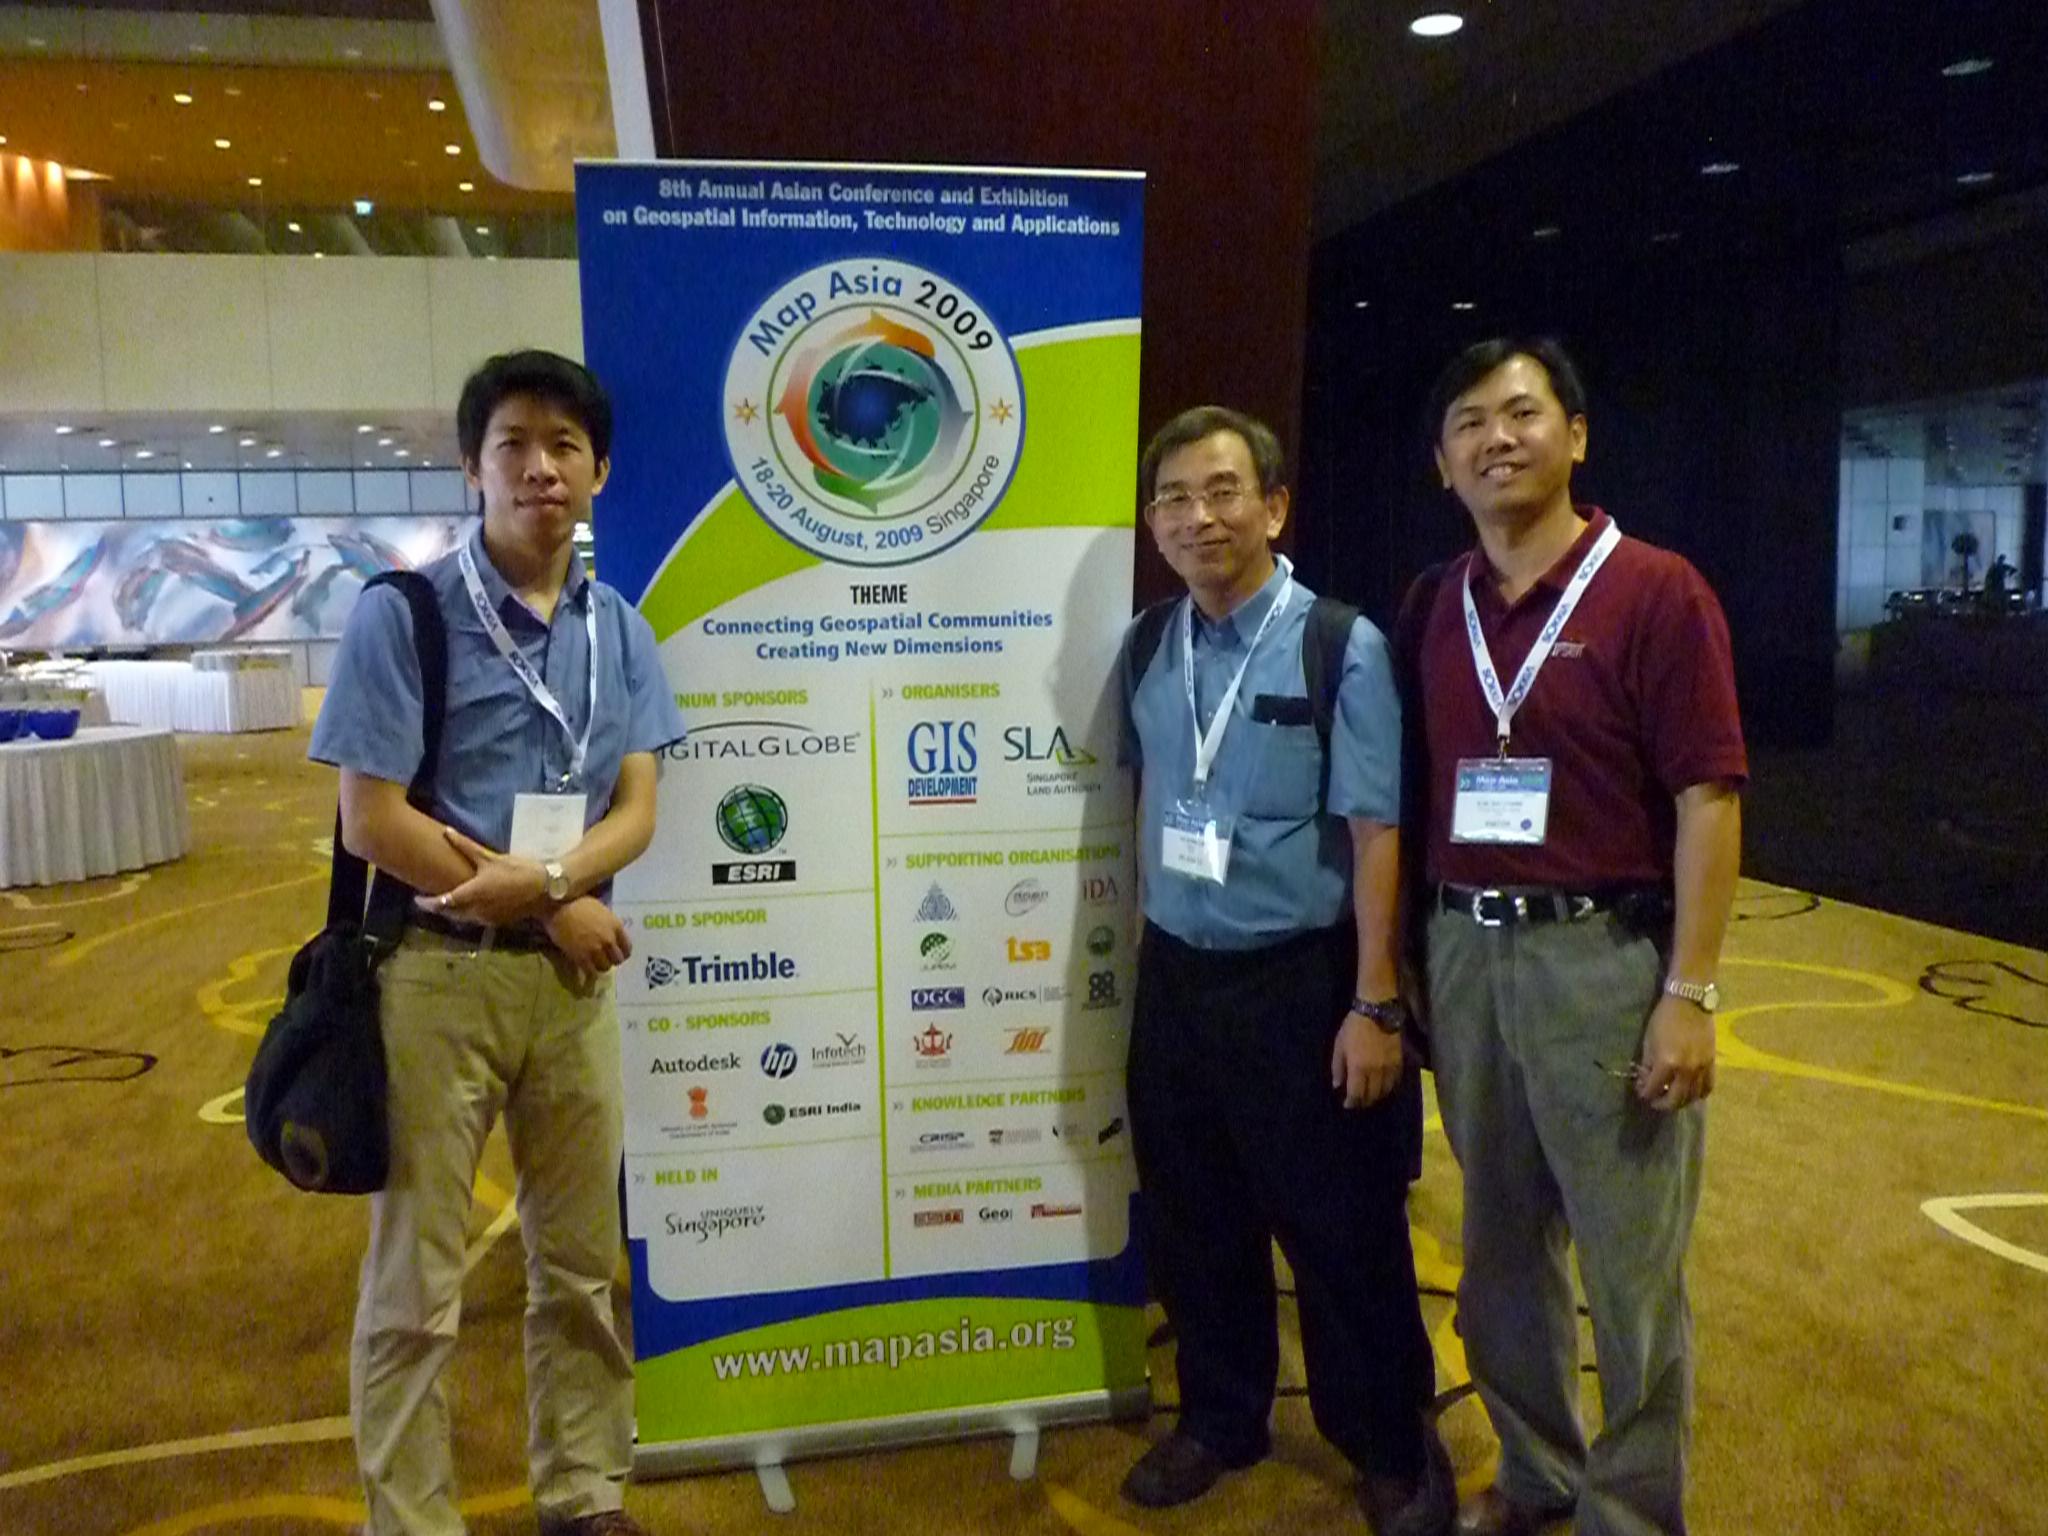 Hurricane reccomend Asian geospatial conference